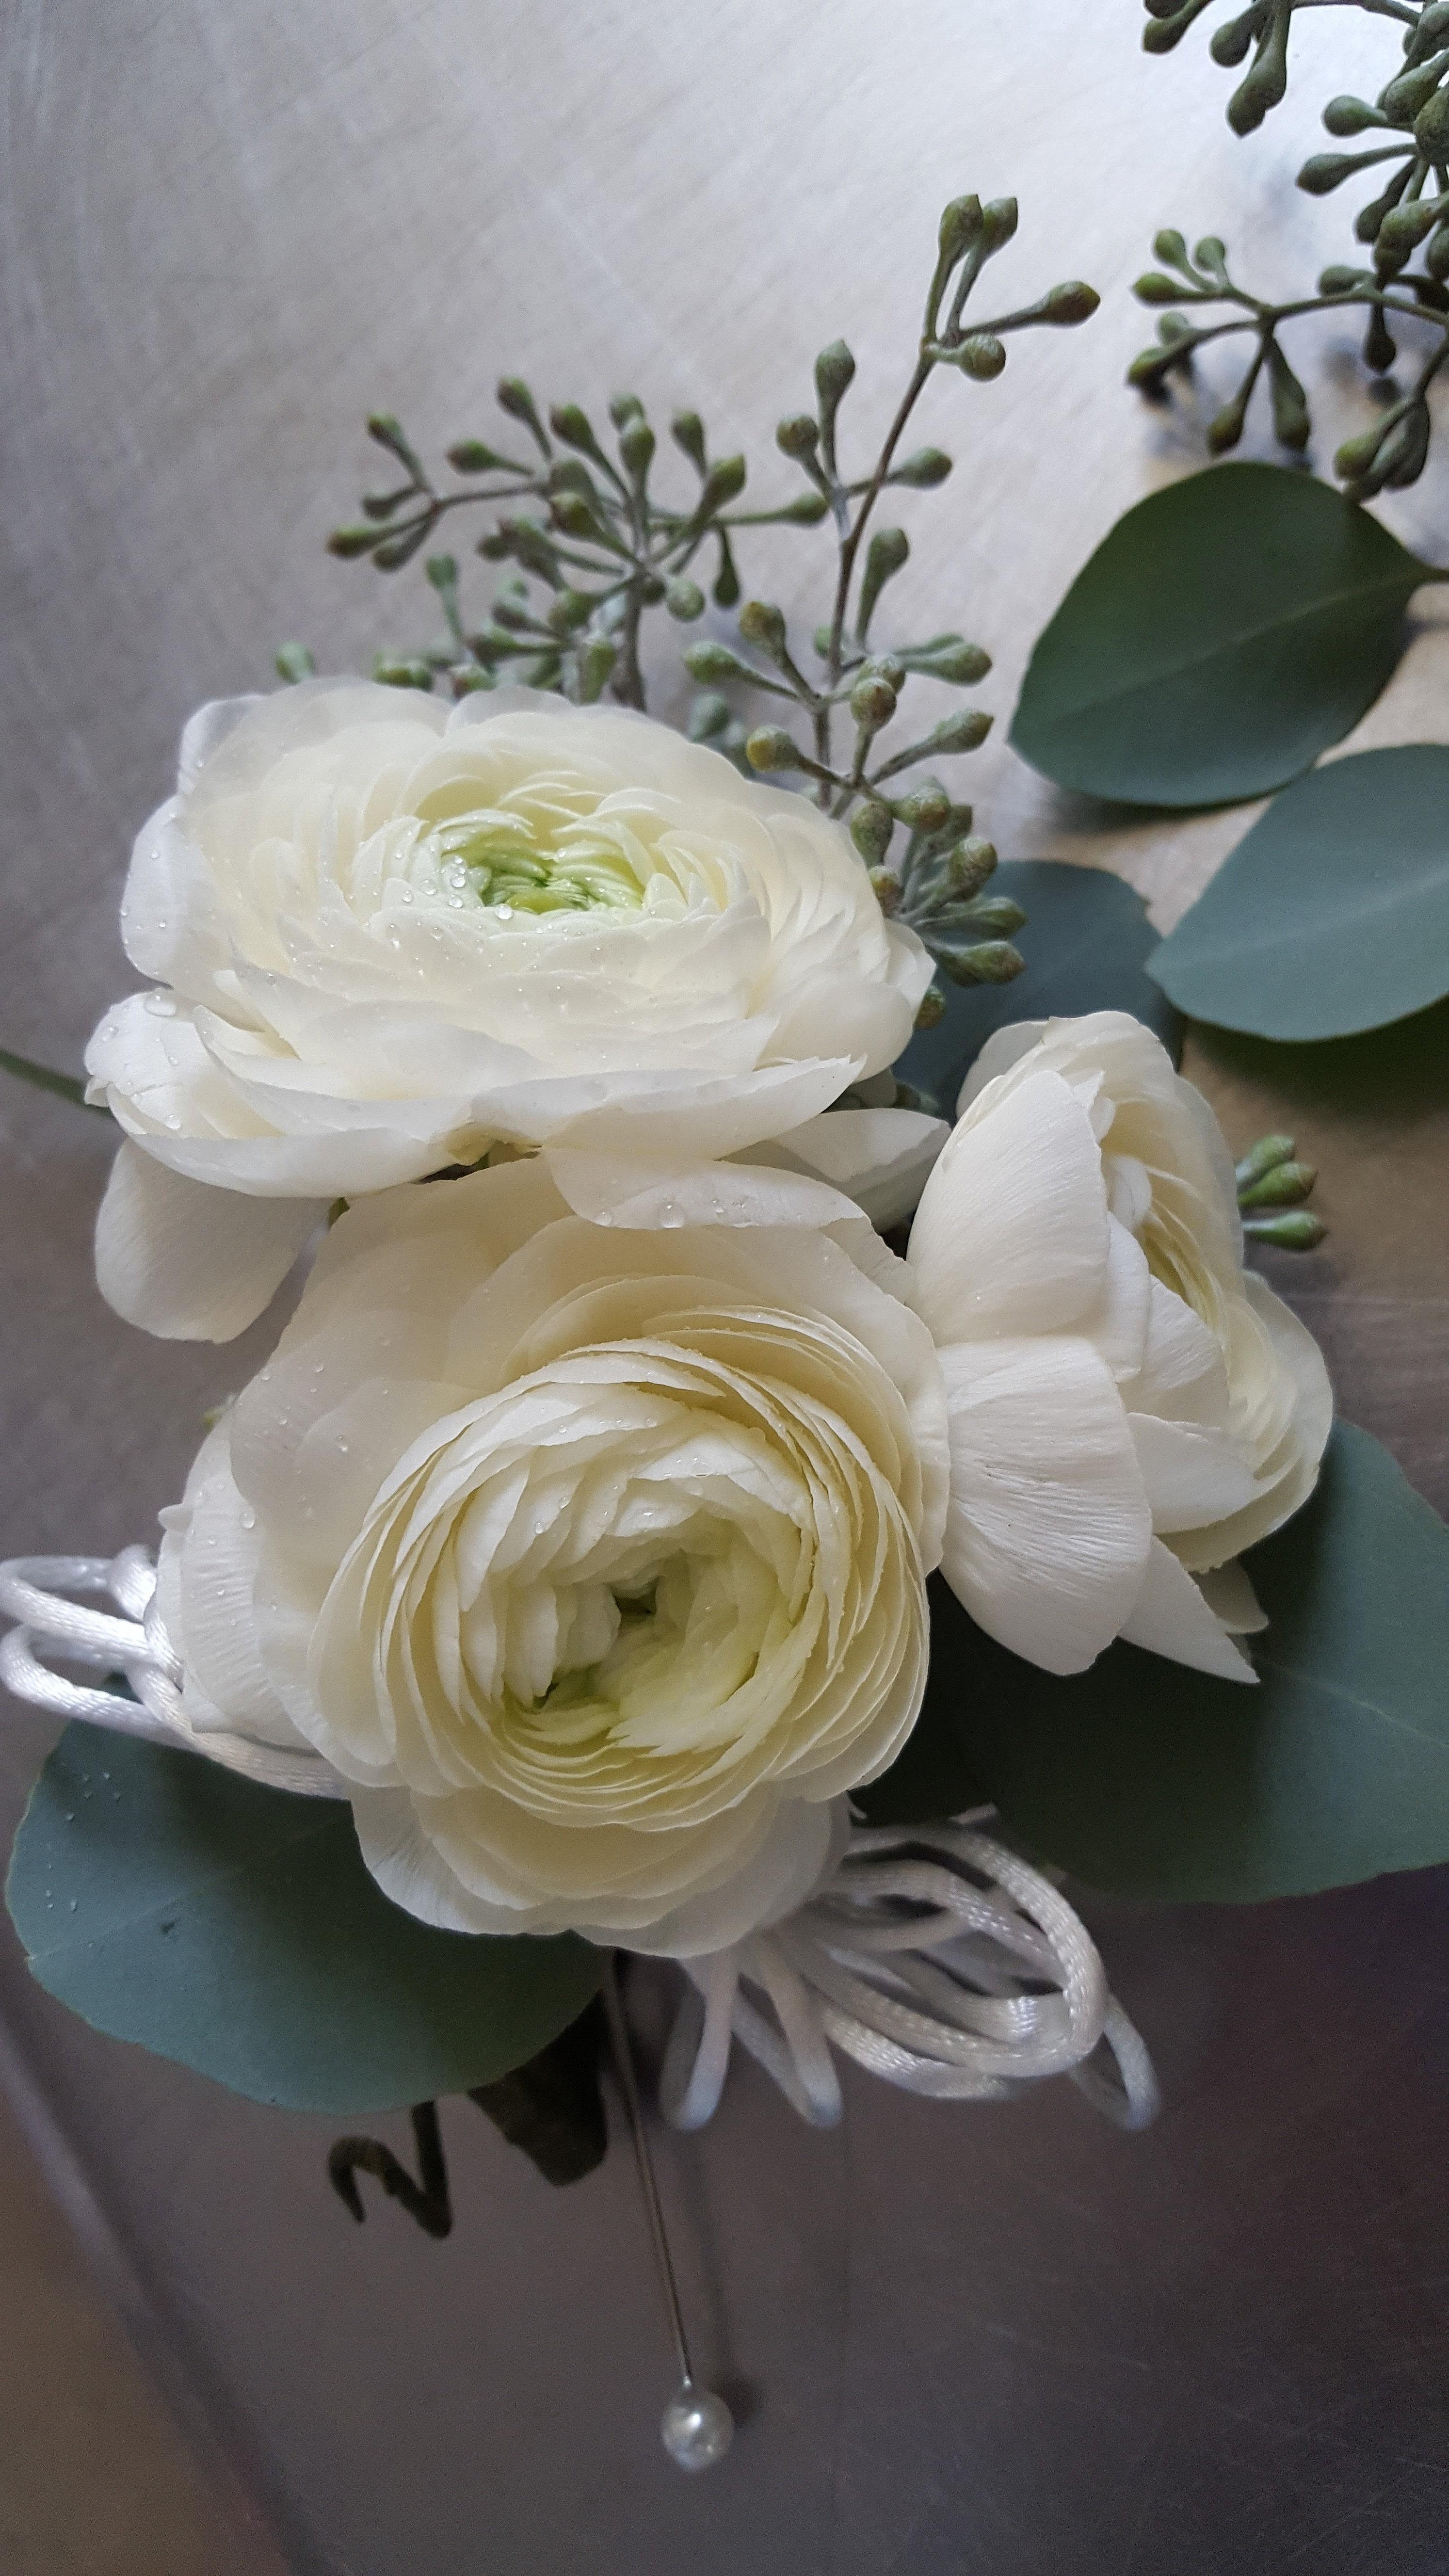 Blossom Floral Design Inside Memorial Hospital South Bend